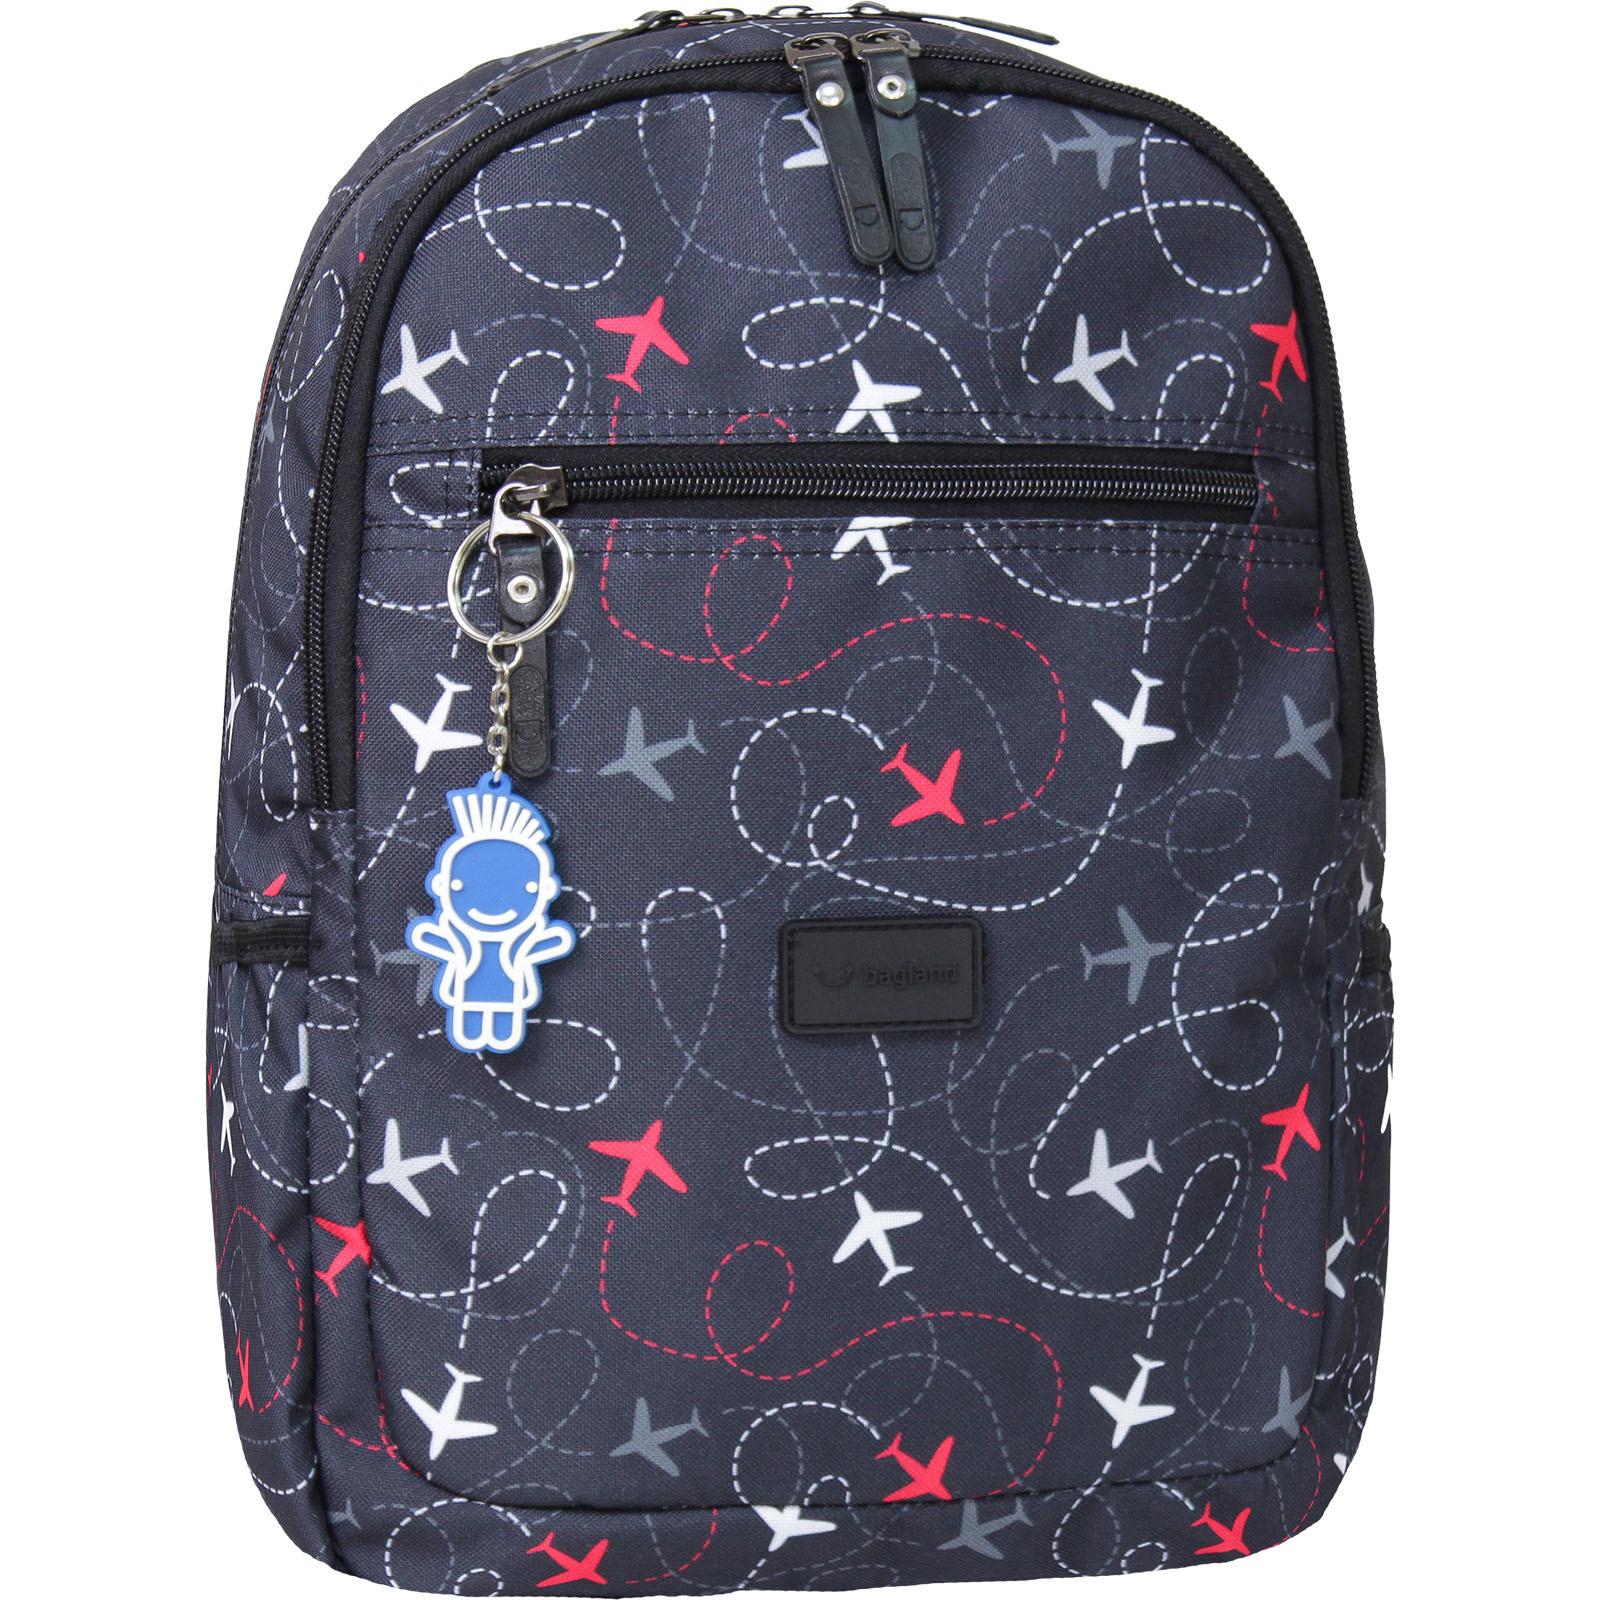 Детские рюкзаки Рюкзак Bagland Young 13 л. сублімація 265 (00510664) IMG_8807-1600.jpg